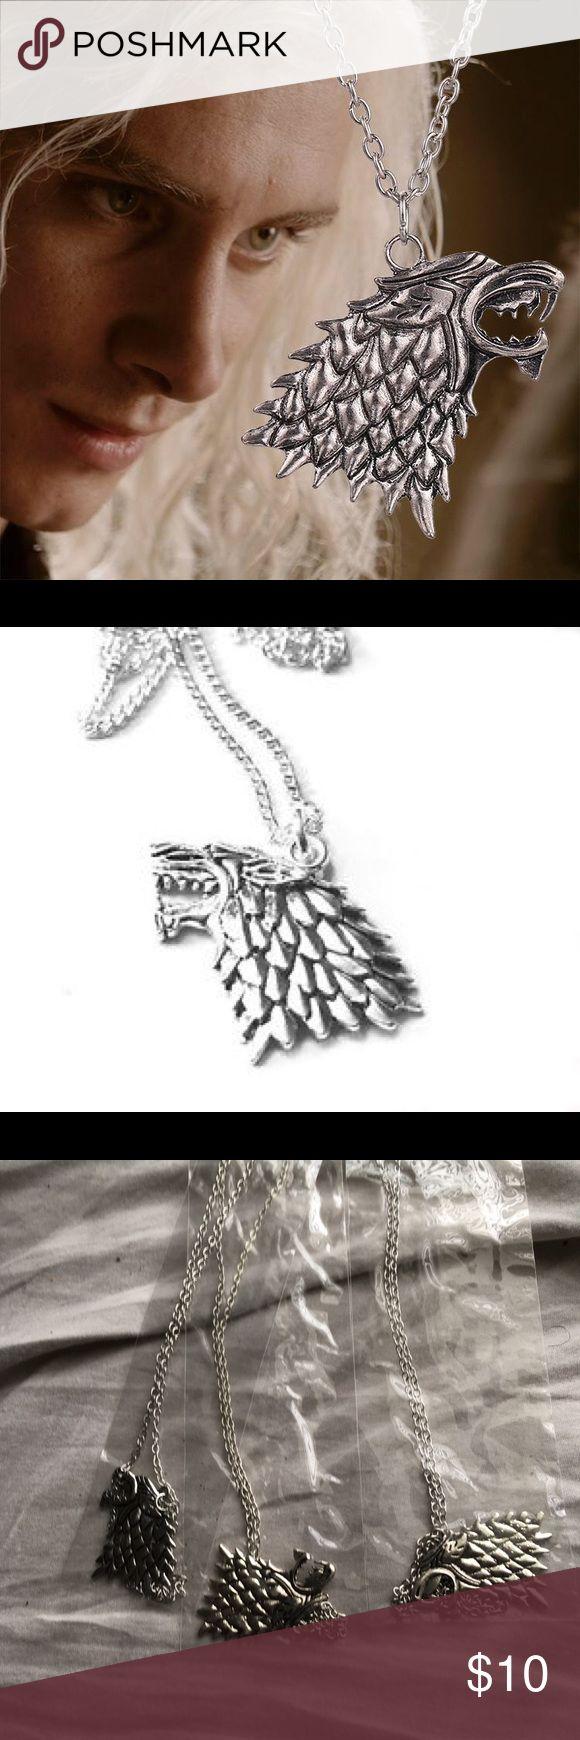 Game Of Thrones Stark Direwolf Necklace ✨NWT Silver Plated Stark Direwolf Necklace Jewelry Necklaces